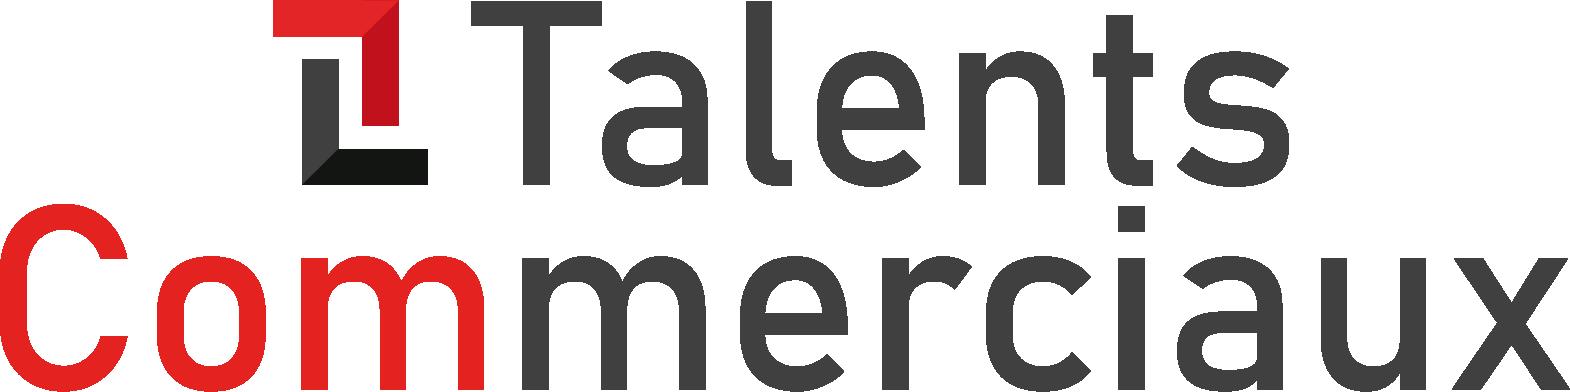 logo Mercom